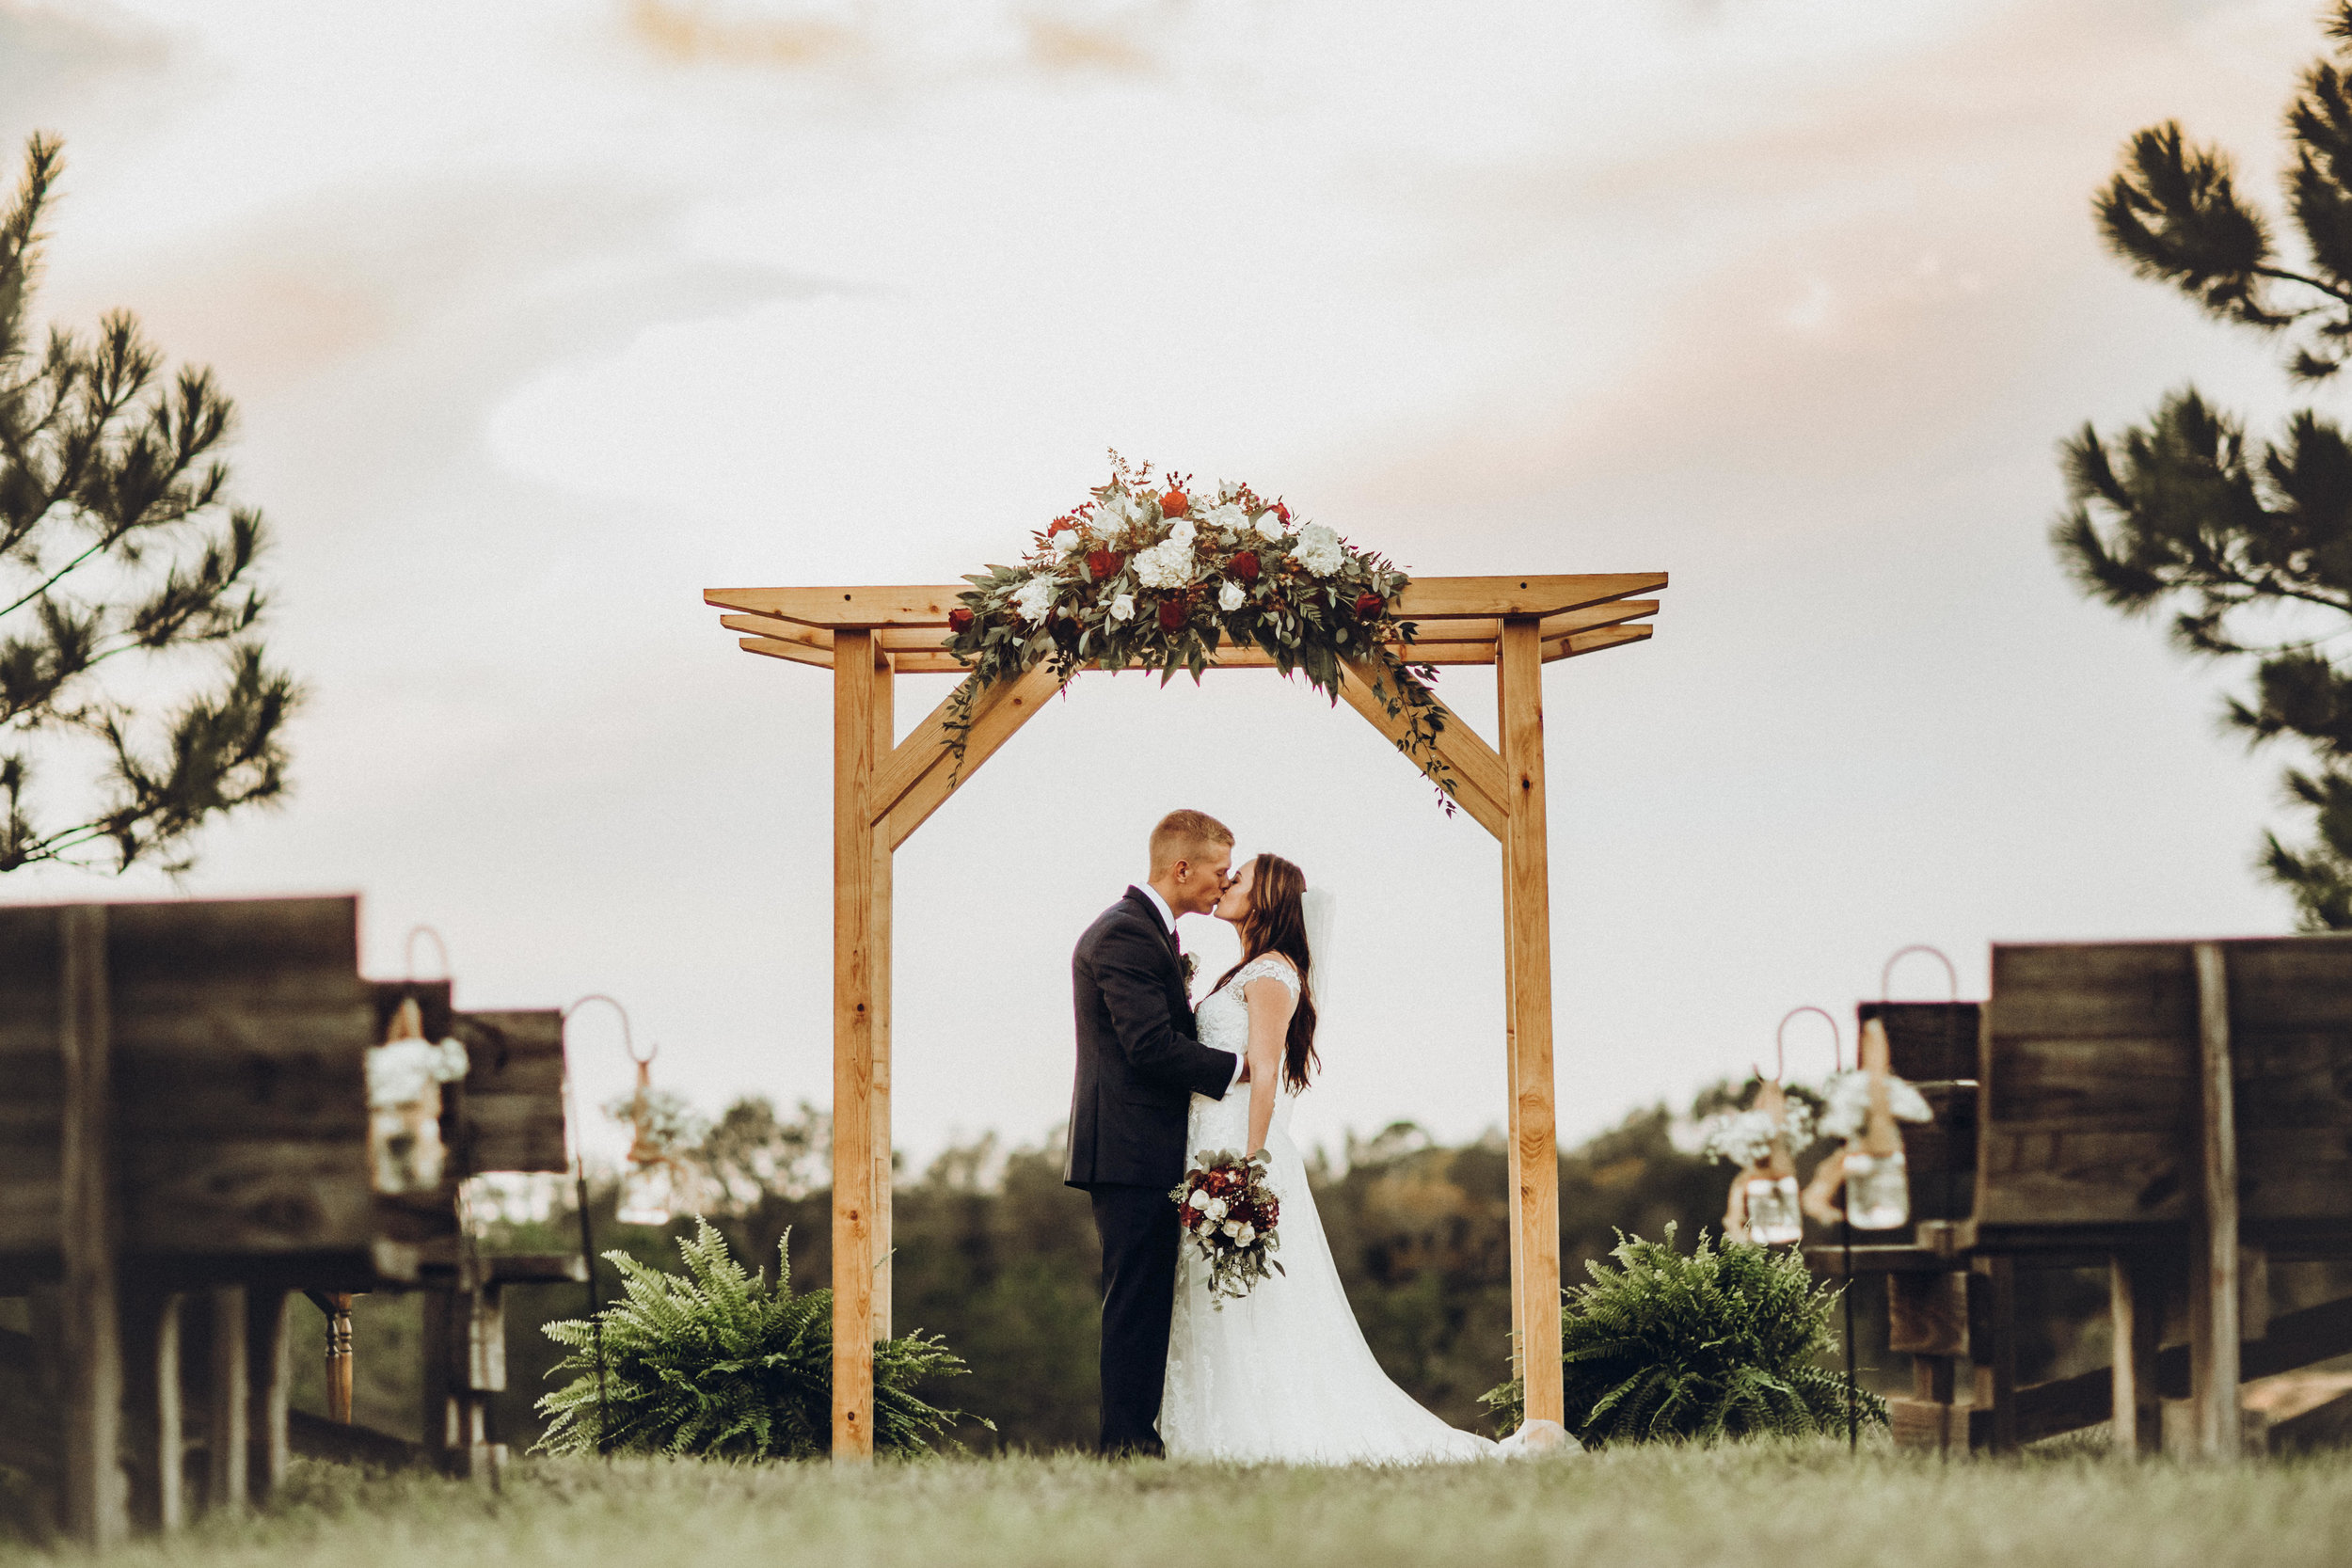 7. Bride + Groom -  Romantic Backyard Farm Wedding - Lauren+Daniel 033.jpg